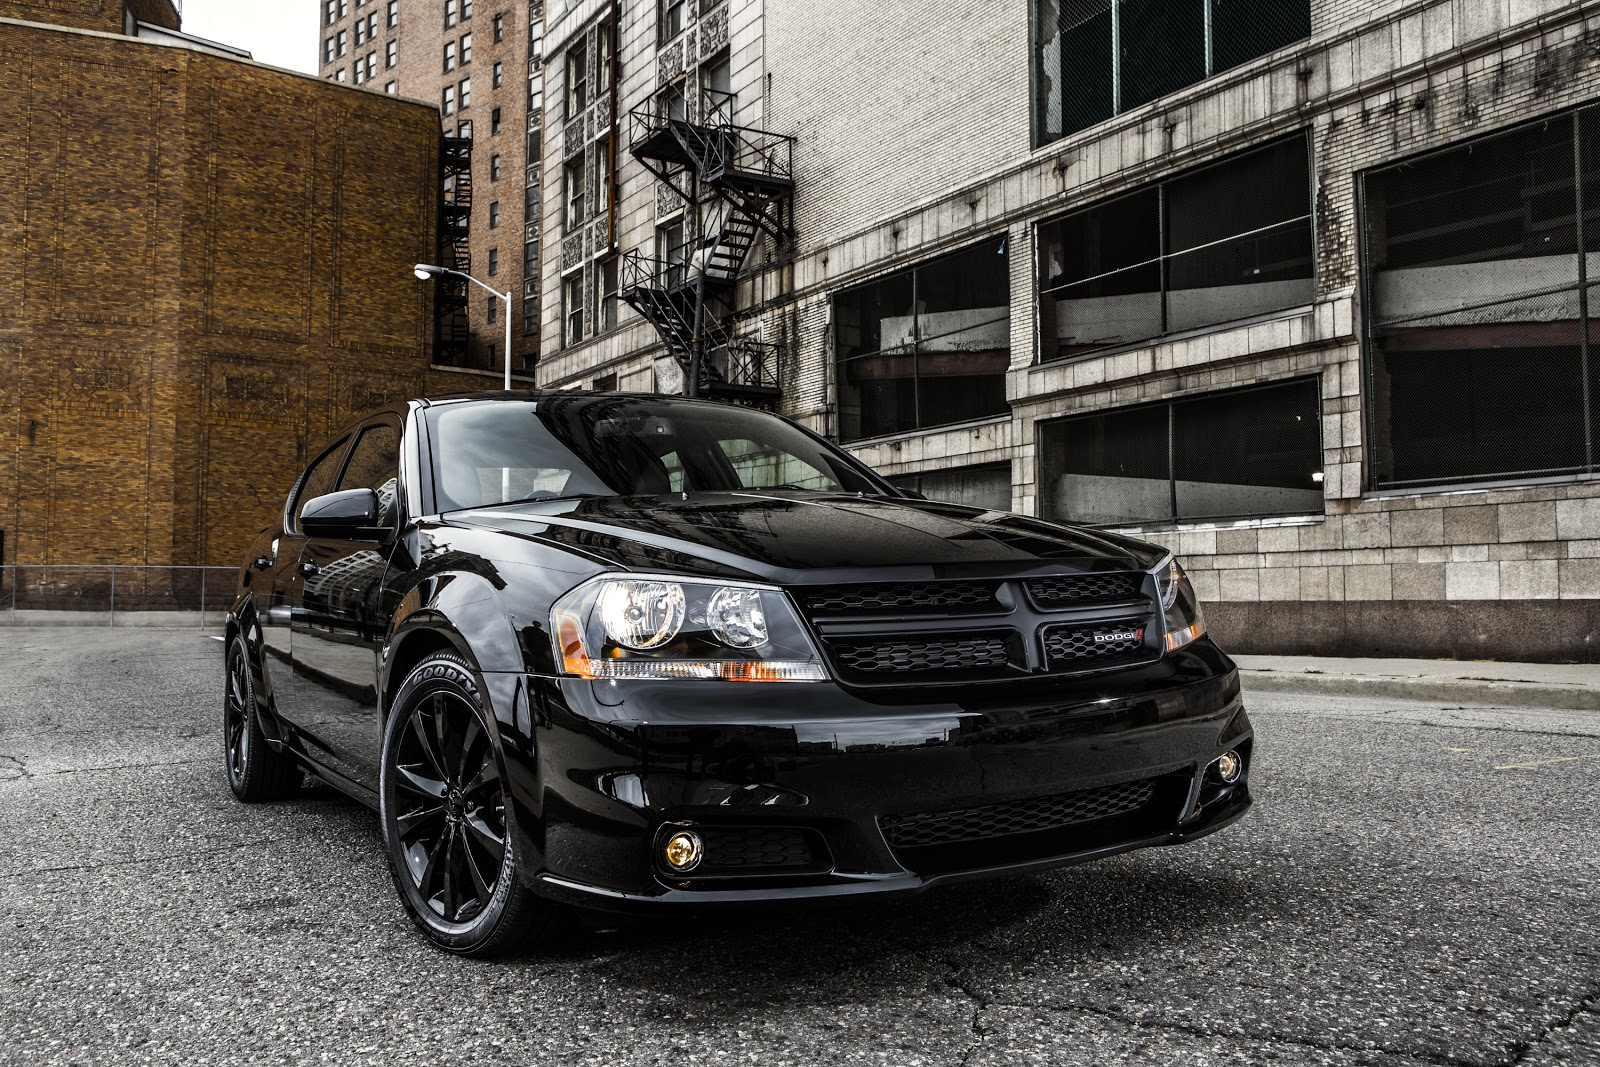 http://1.bp.blogspot.com/-Bph0LZRgB98/UJPVjHF0HWI/AAAAAAAAas4/BxlSsOov40Y/s1600/2013+Dodge+Avenger+Blacktop+Edition+5.jpg